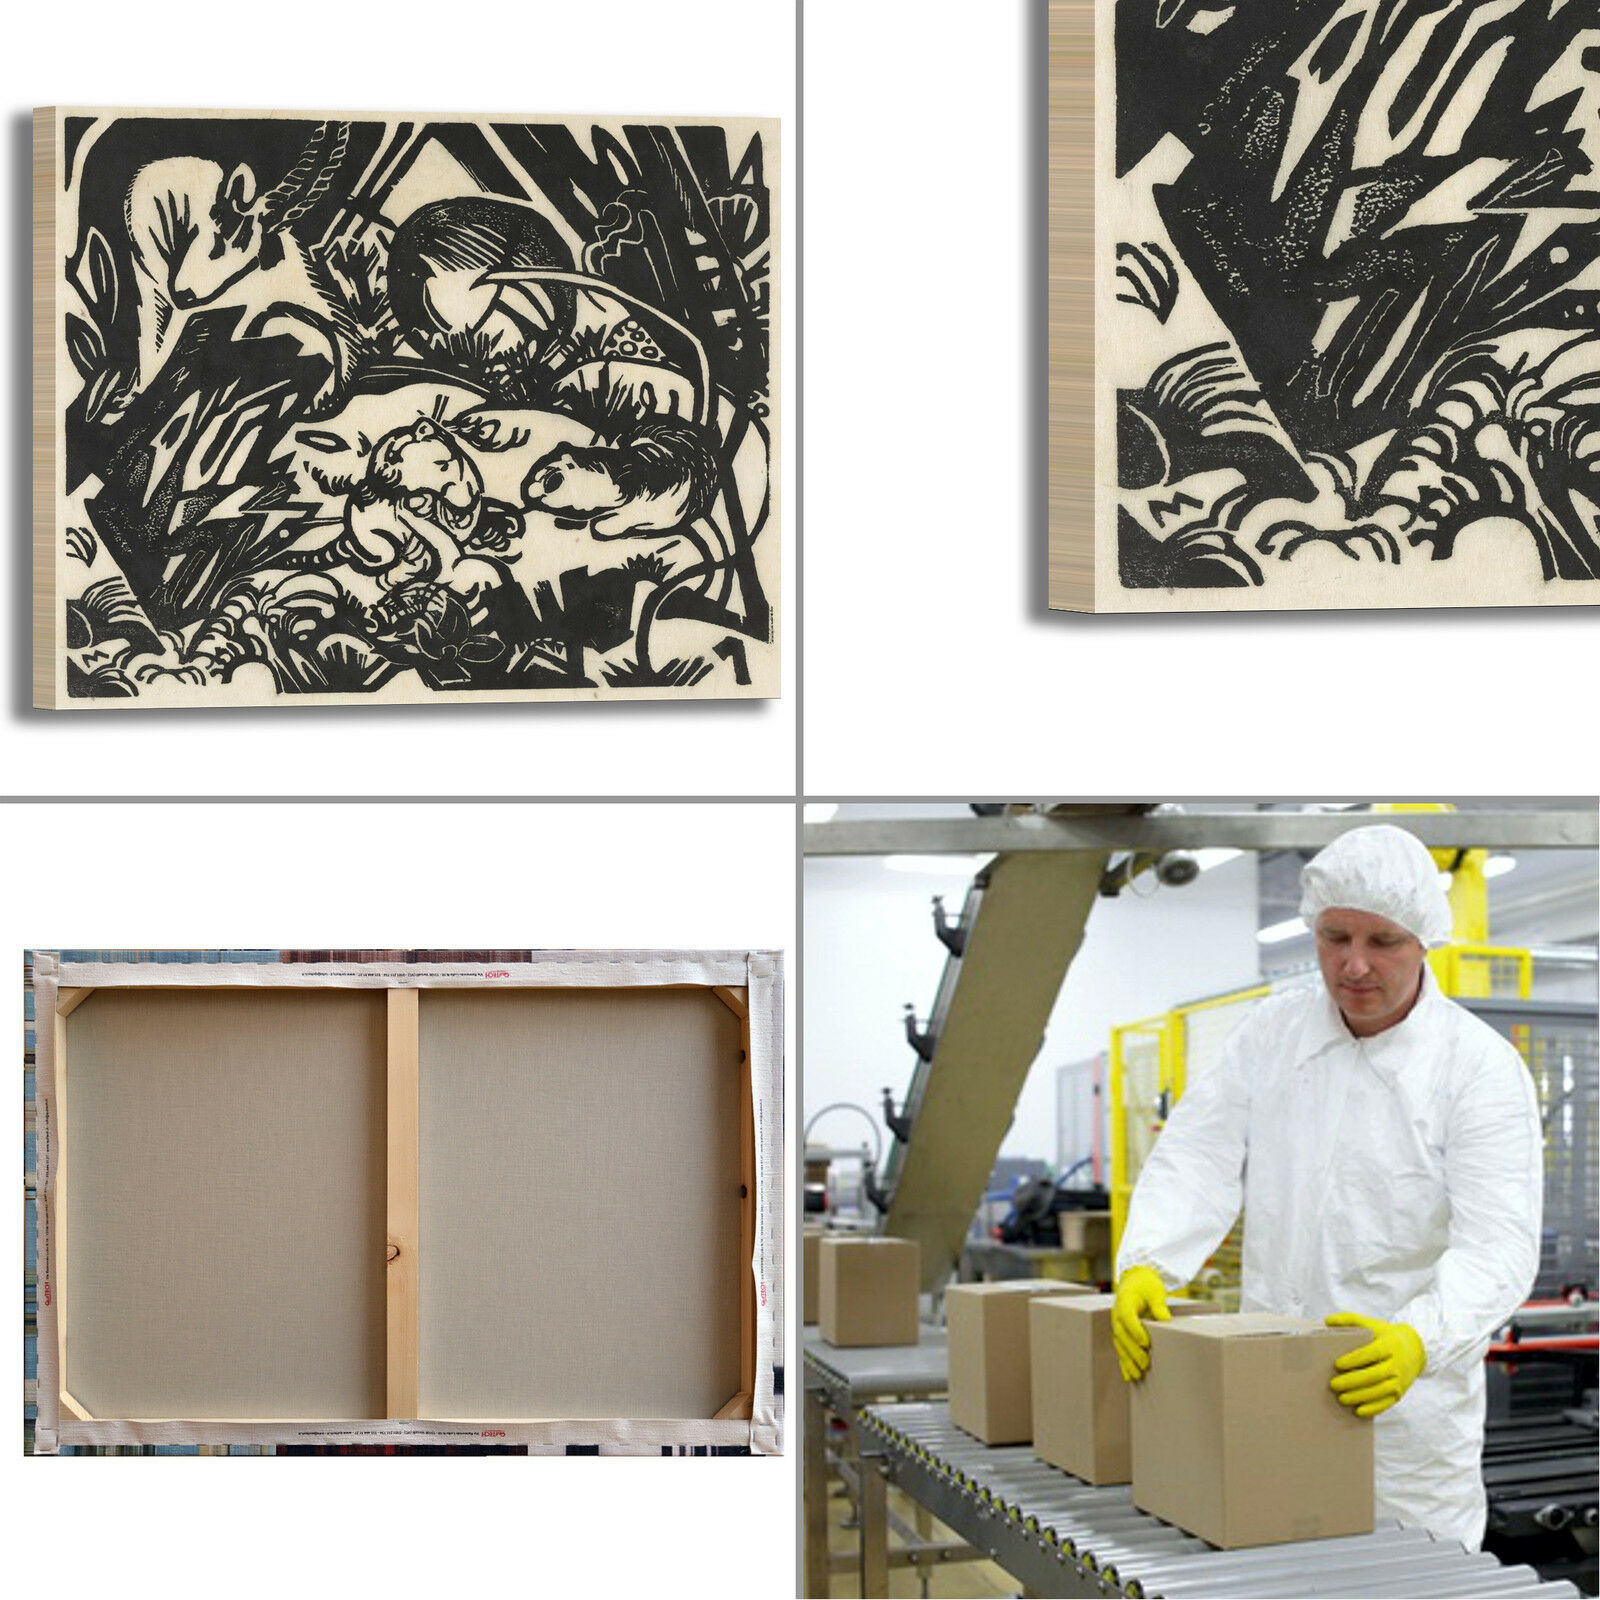 Franz Marc stampa animale leggenda design quadro stampa Marc tela dipinto telaio arRouge o casa f52697